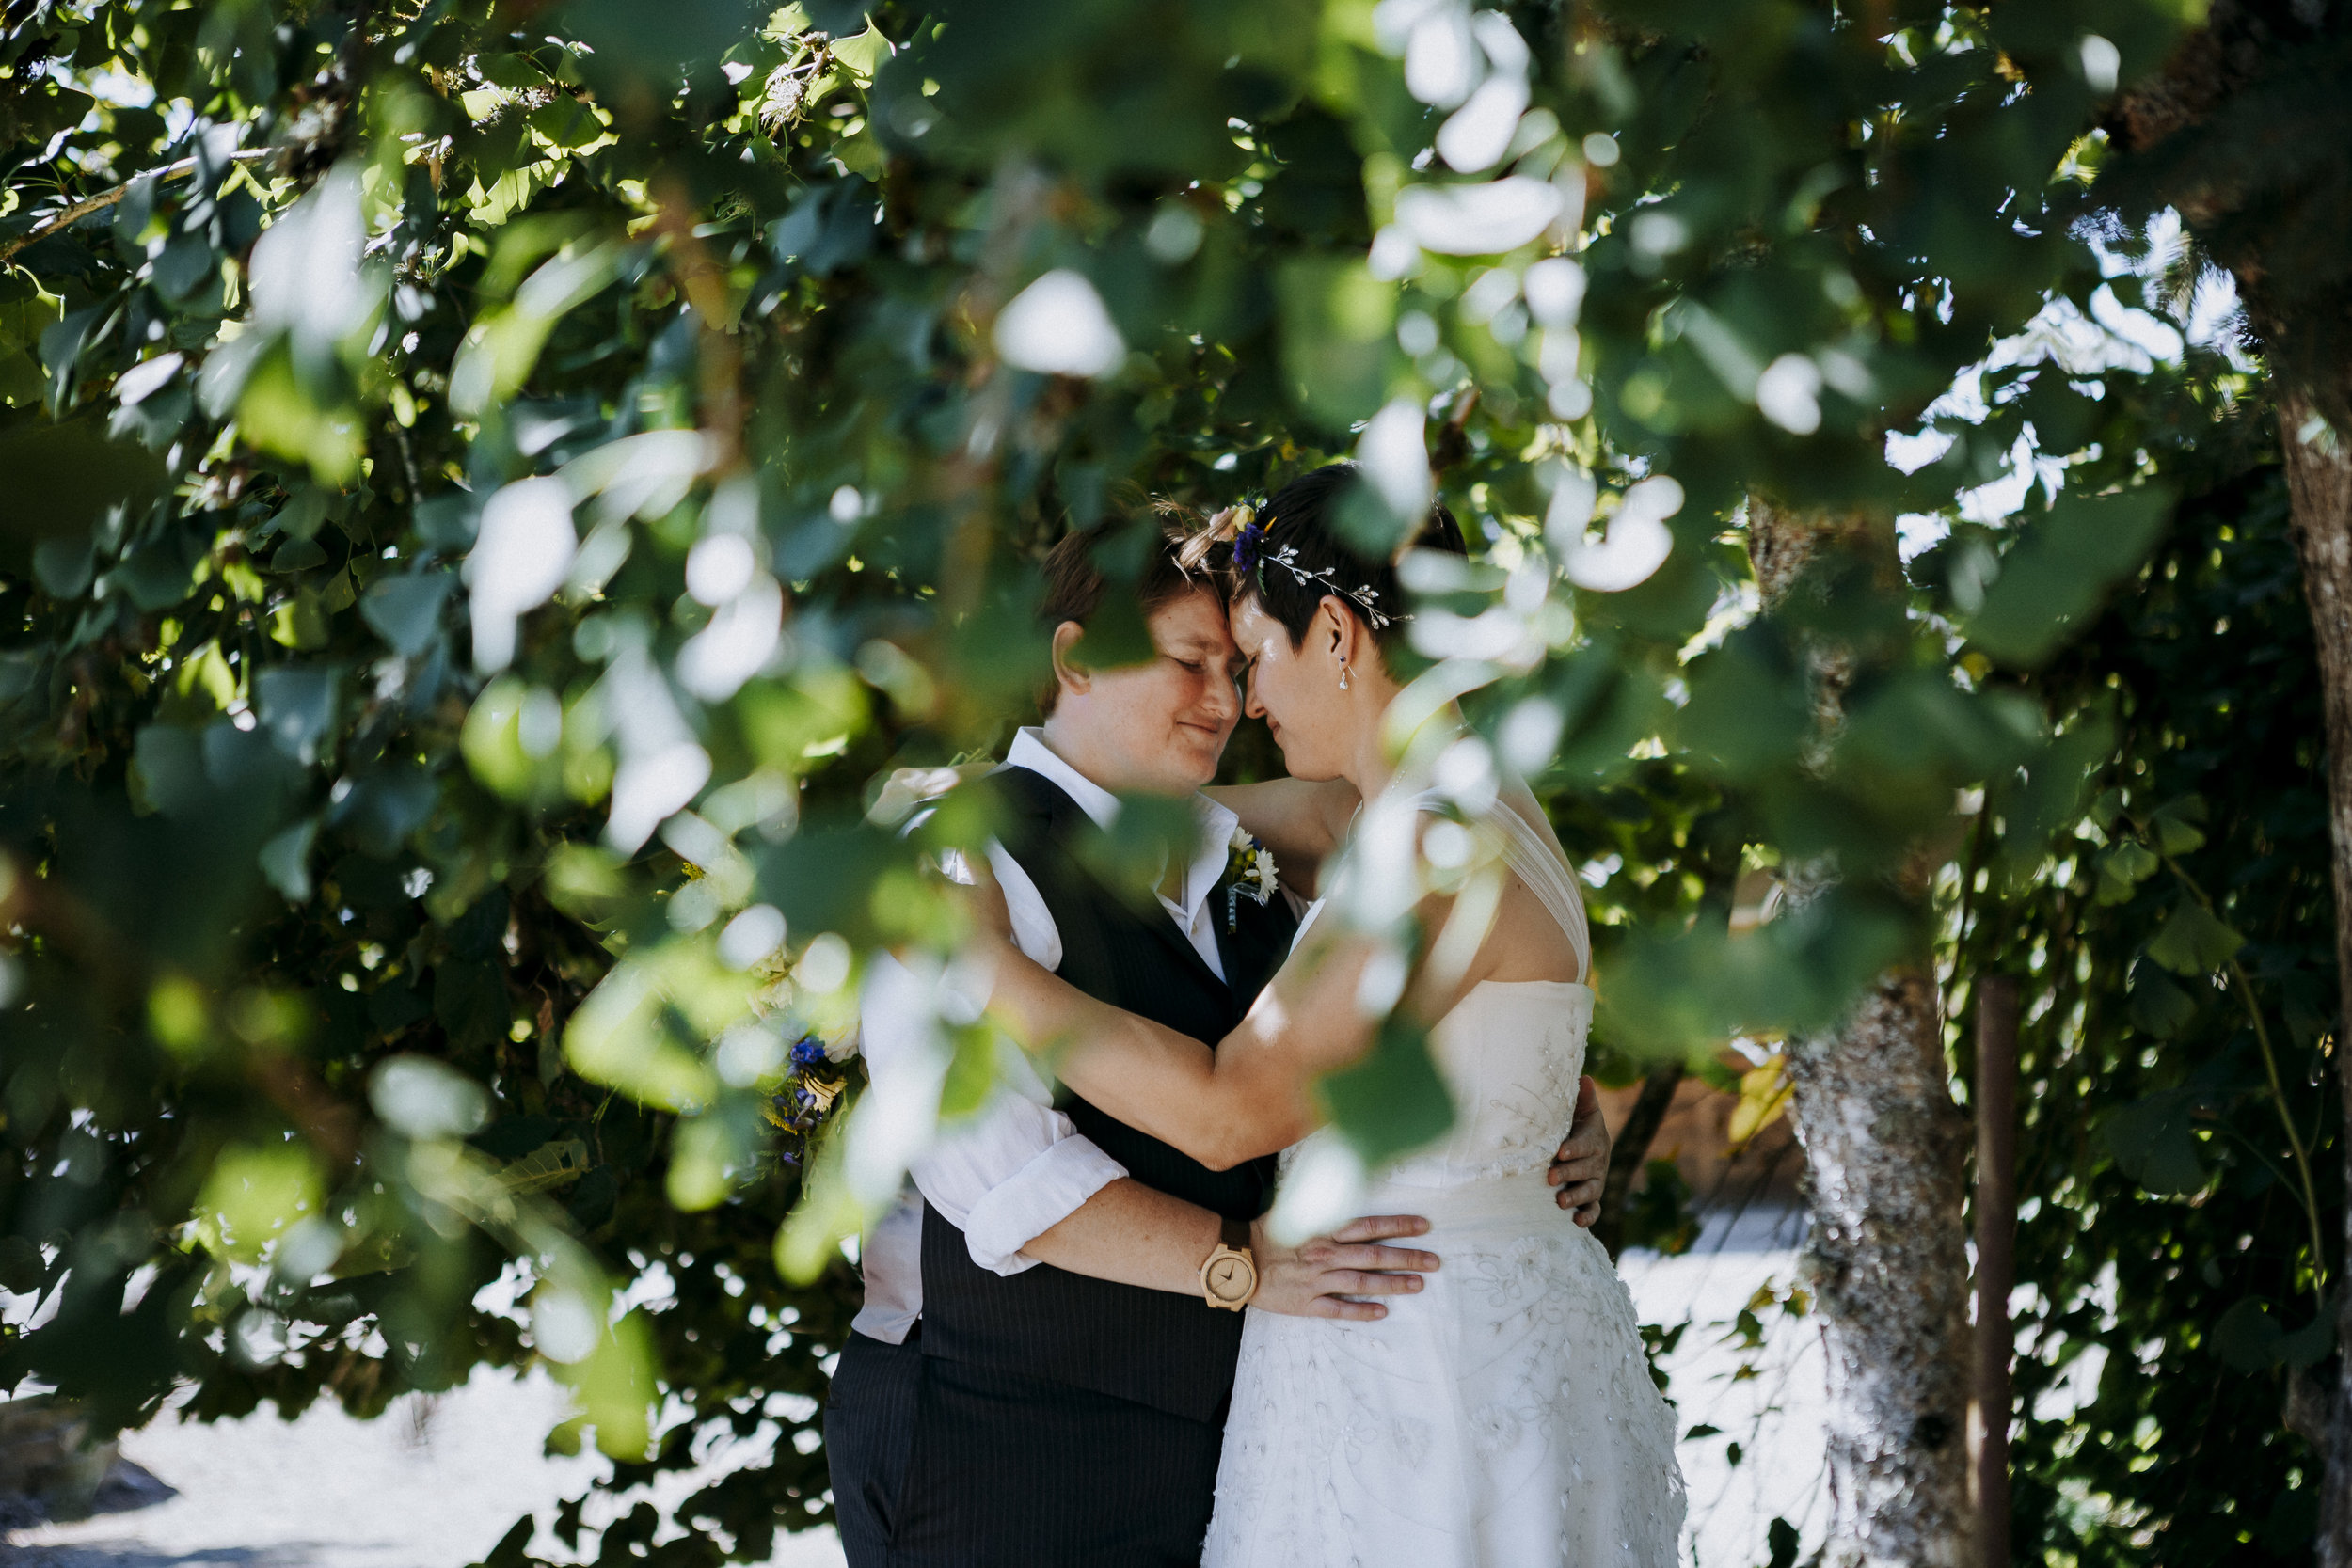 corvalllis-wedding-photographer-lgbt-friendly-photographer-oregon.jpg